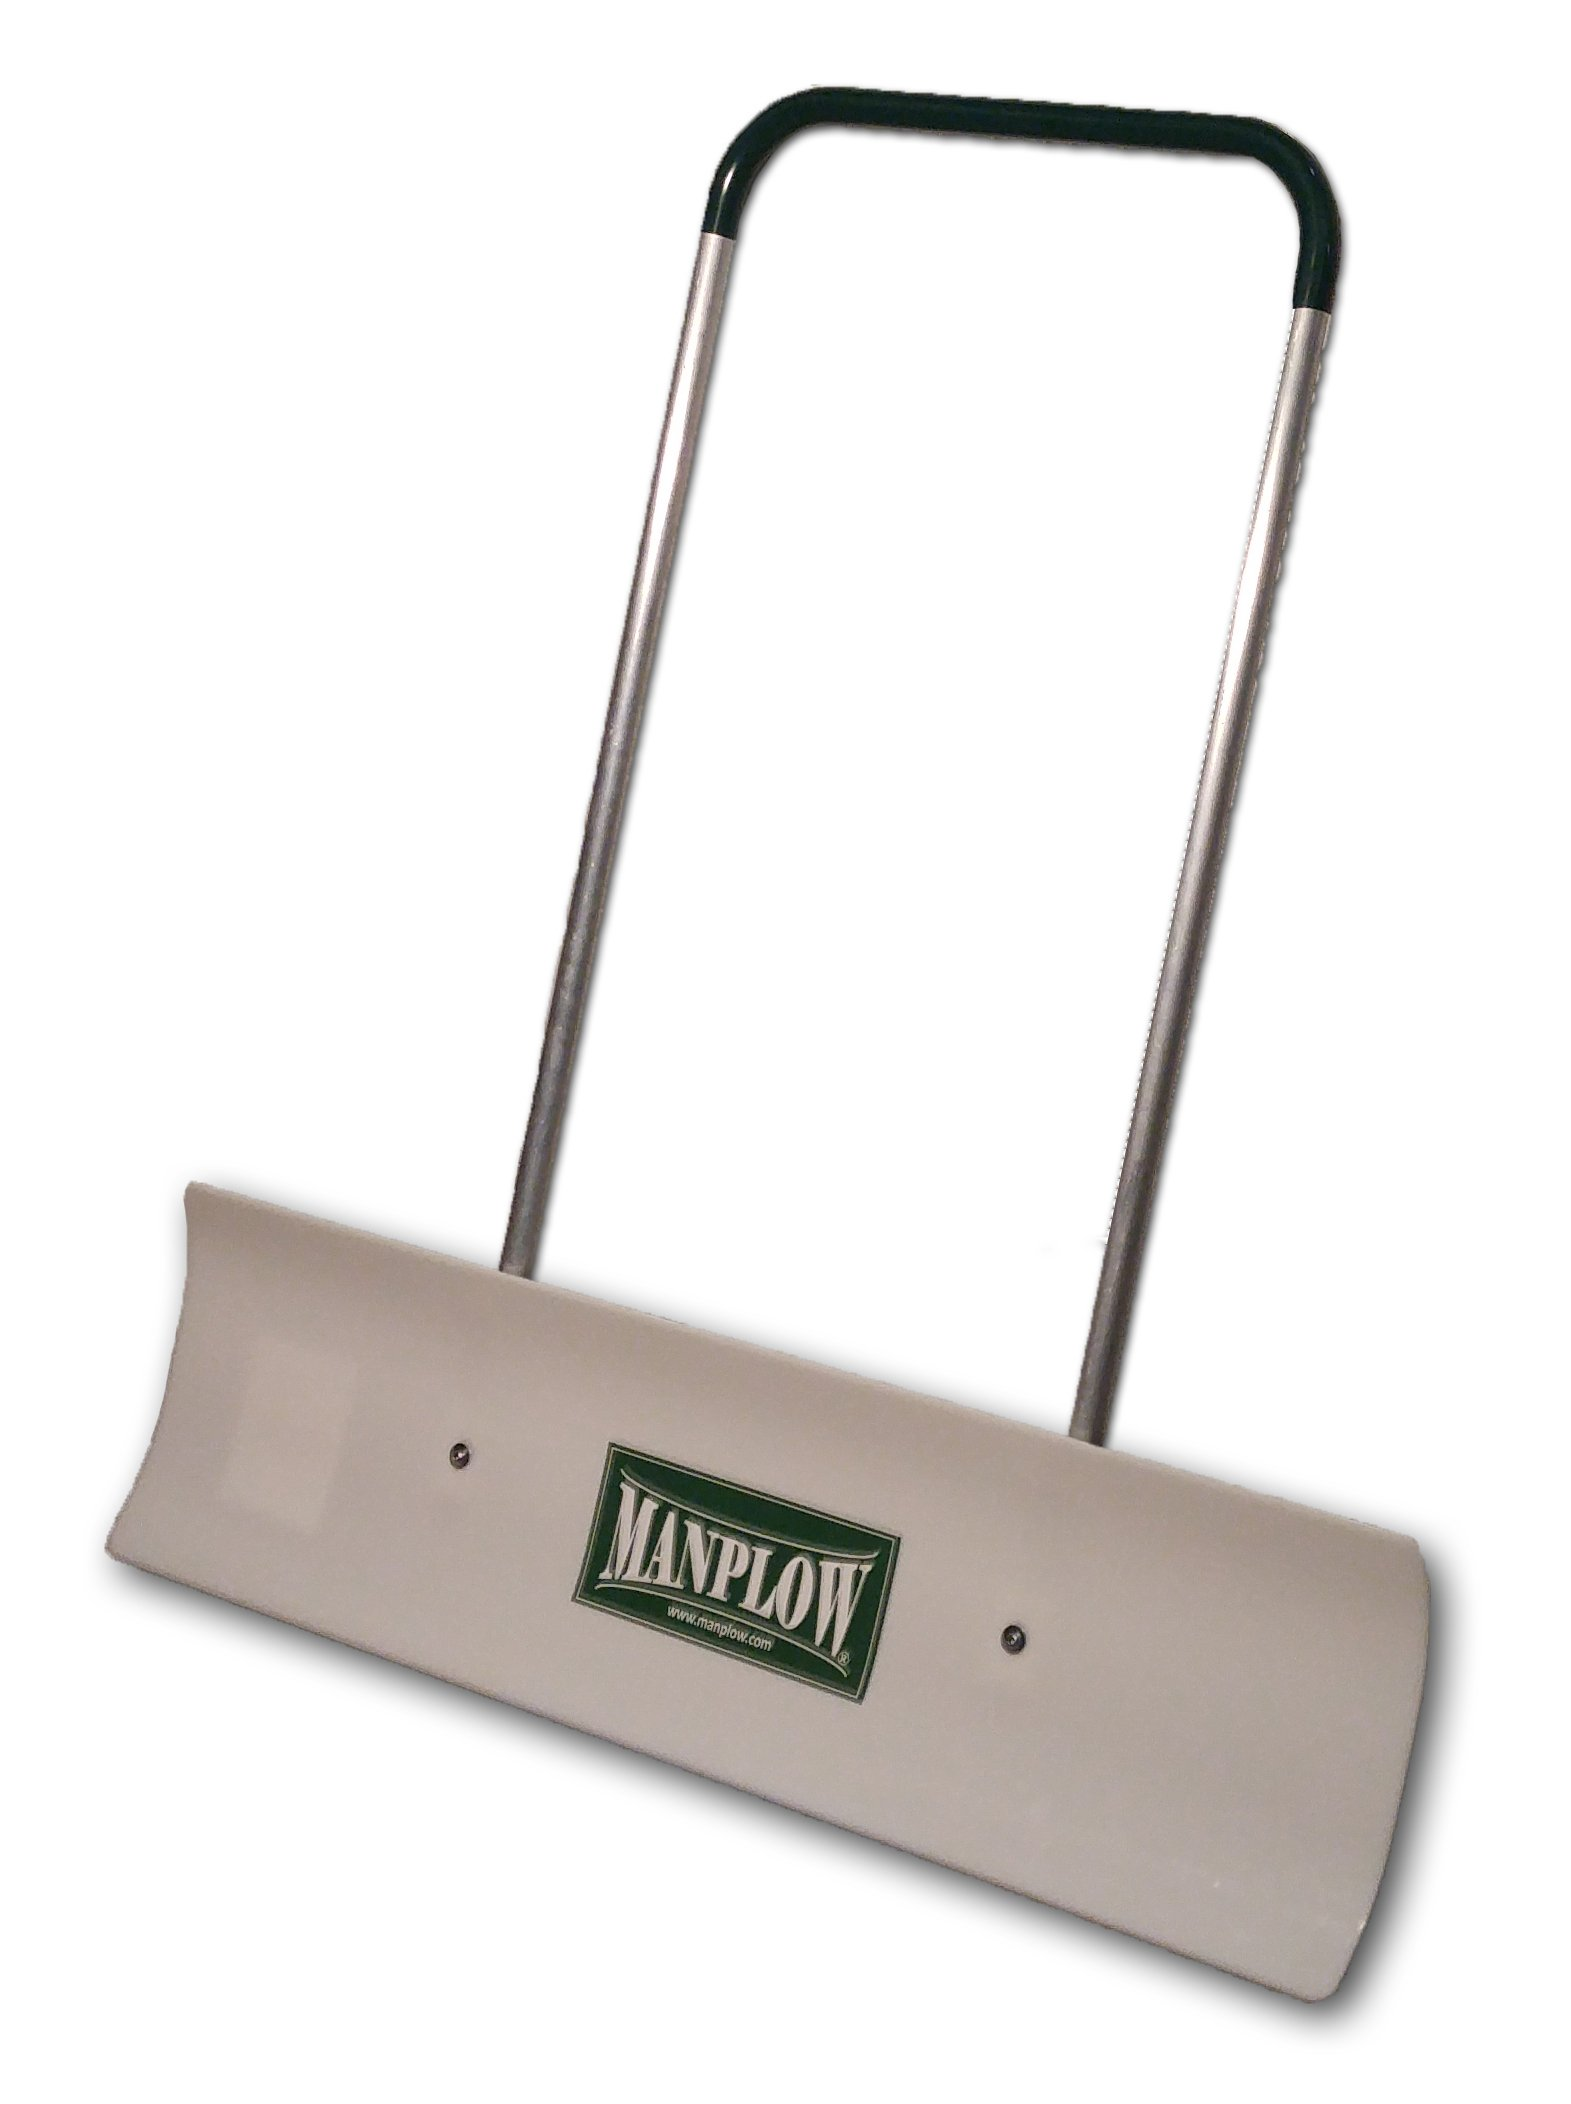 Manplow REV423PK - 42 Inch Revolution Snow Pusher with rotating blade  & Aluminum U Handle w/ No-Slip Grip (Pack of 3)